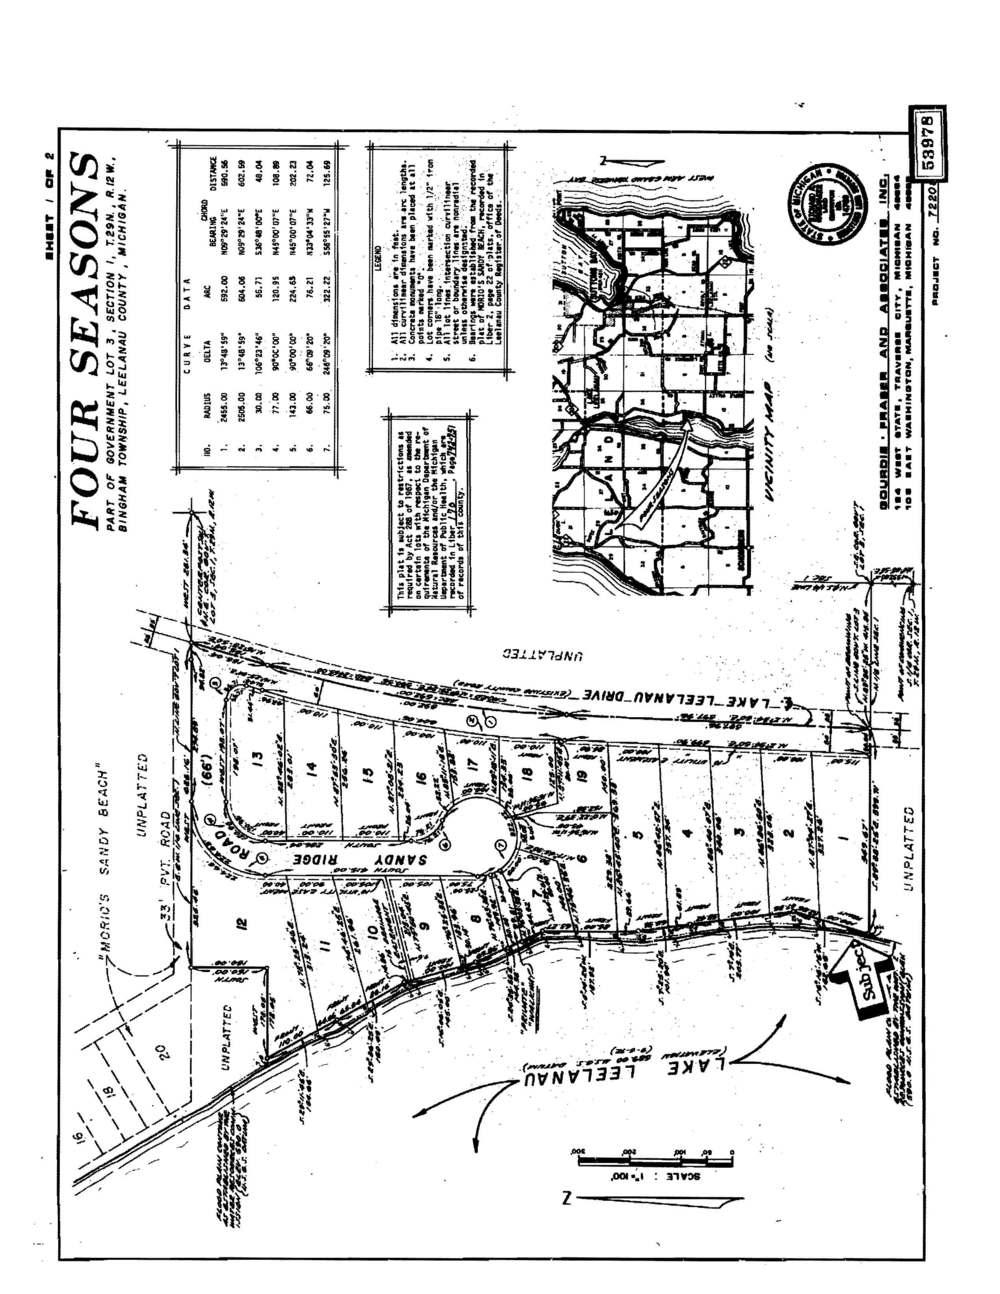 2736 S Lake Leelanau Dr, South Lake Leelanau Waterfront for sale by Oltersdorf Realty LLC - Marketing Packet (10).jpg